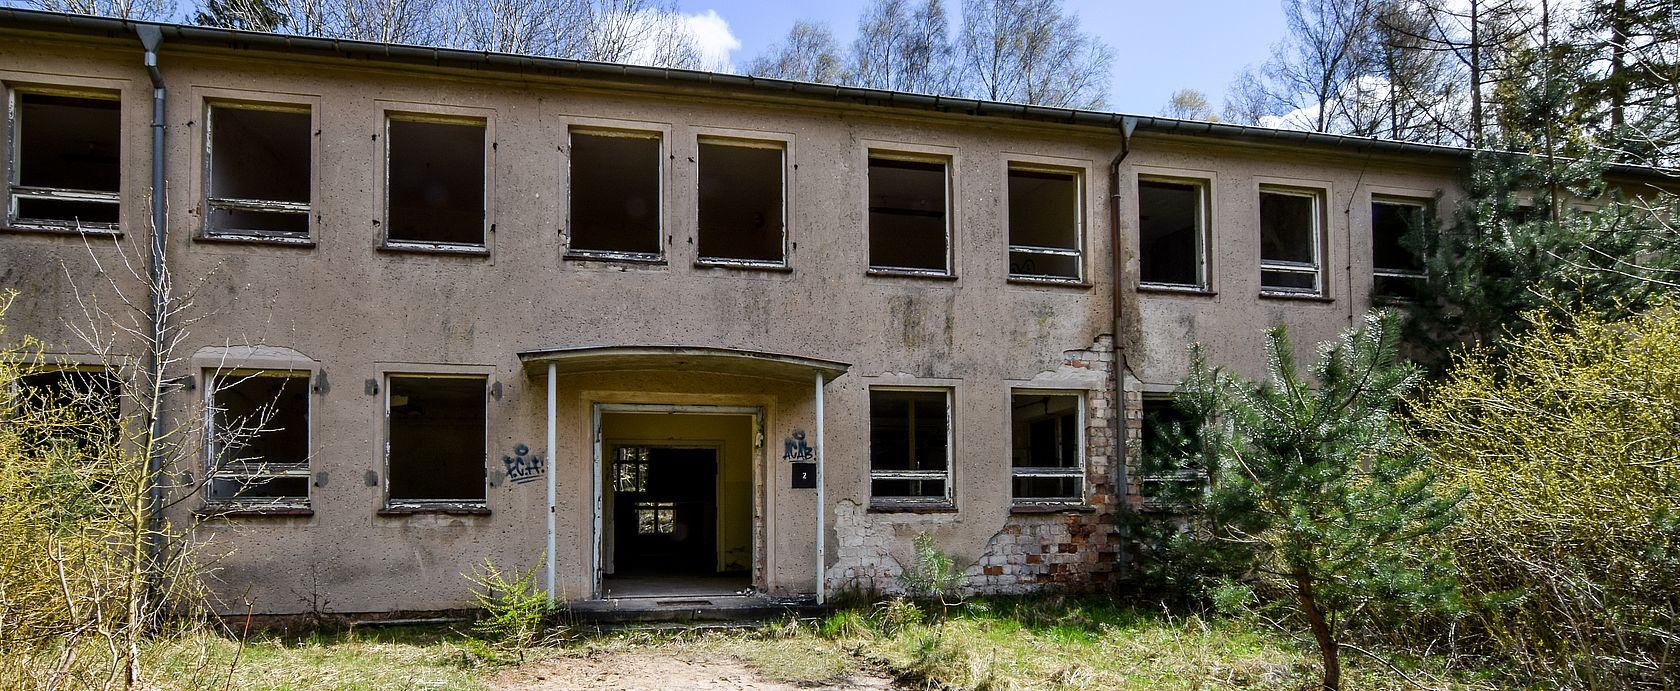 Die leeren Häuser